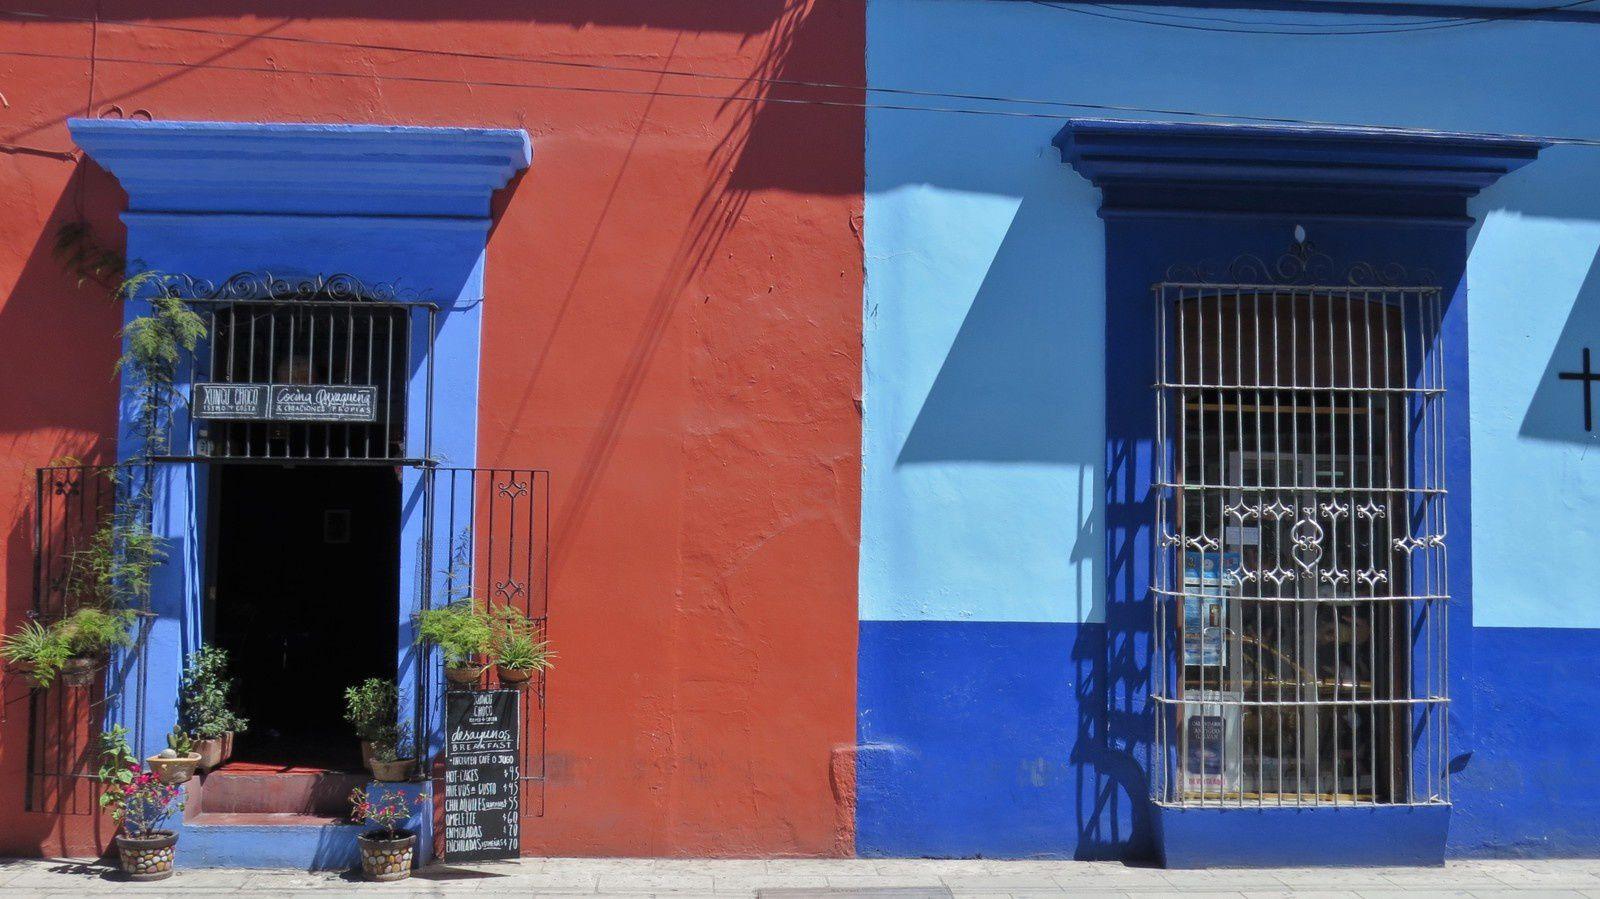 TRANSAMERICA (2.3.- Mexico, Oaxaca)